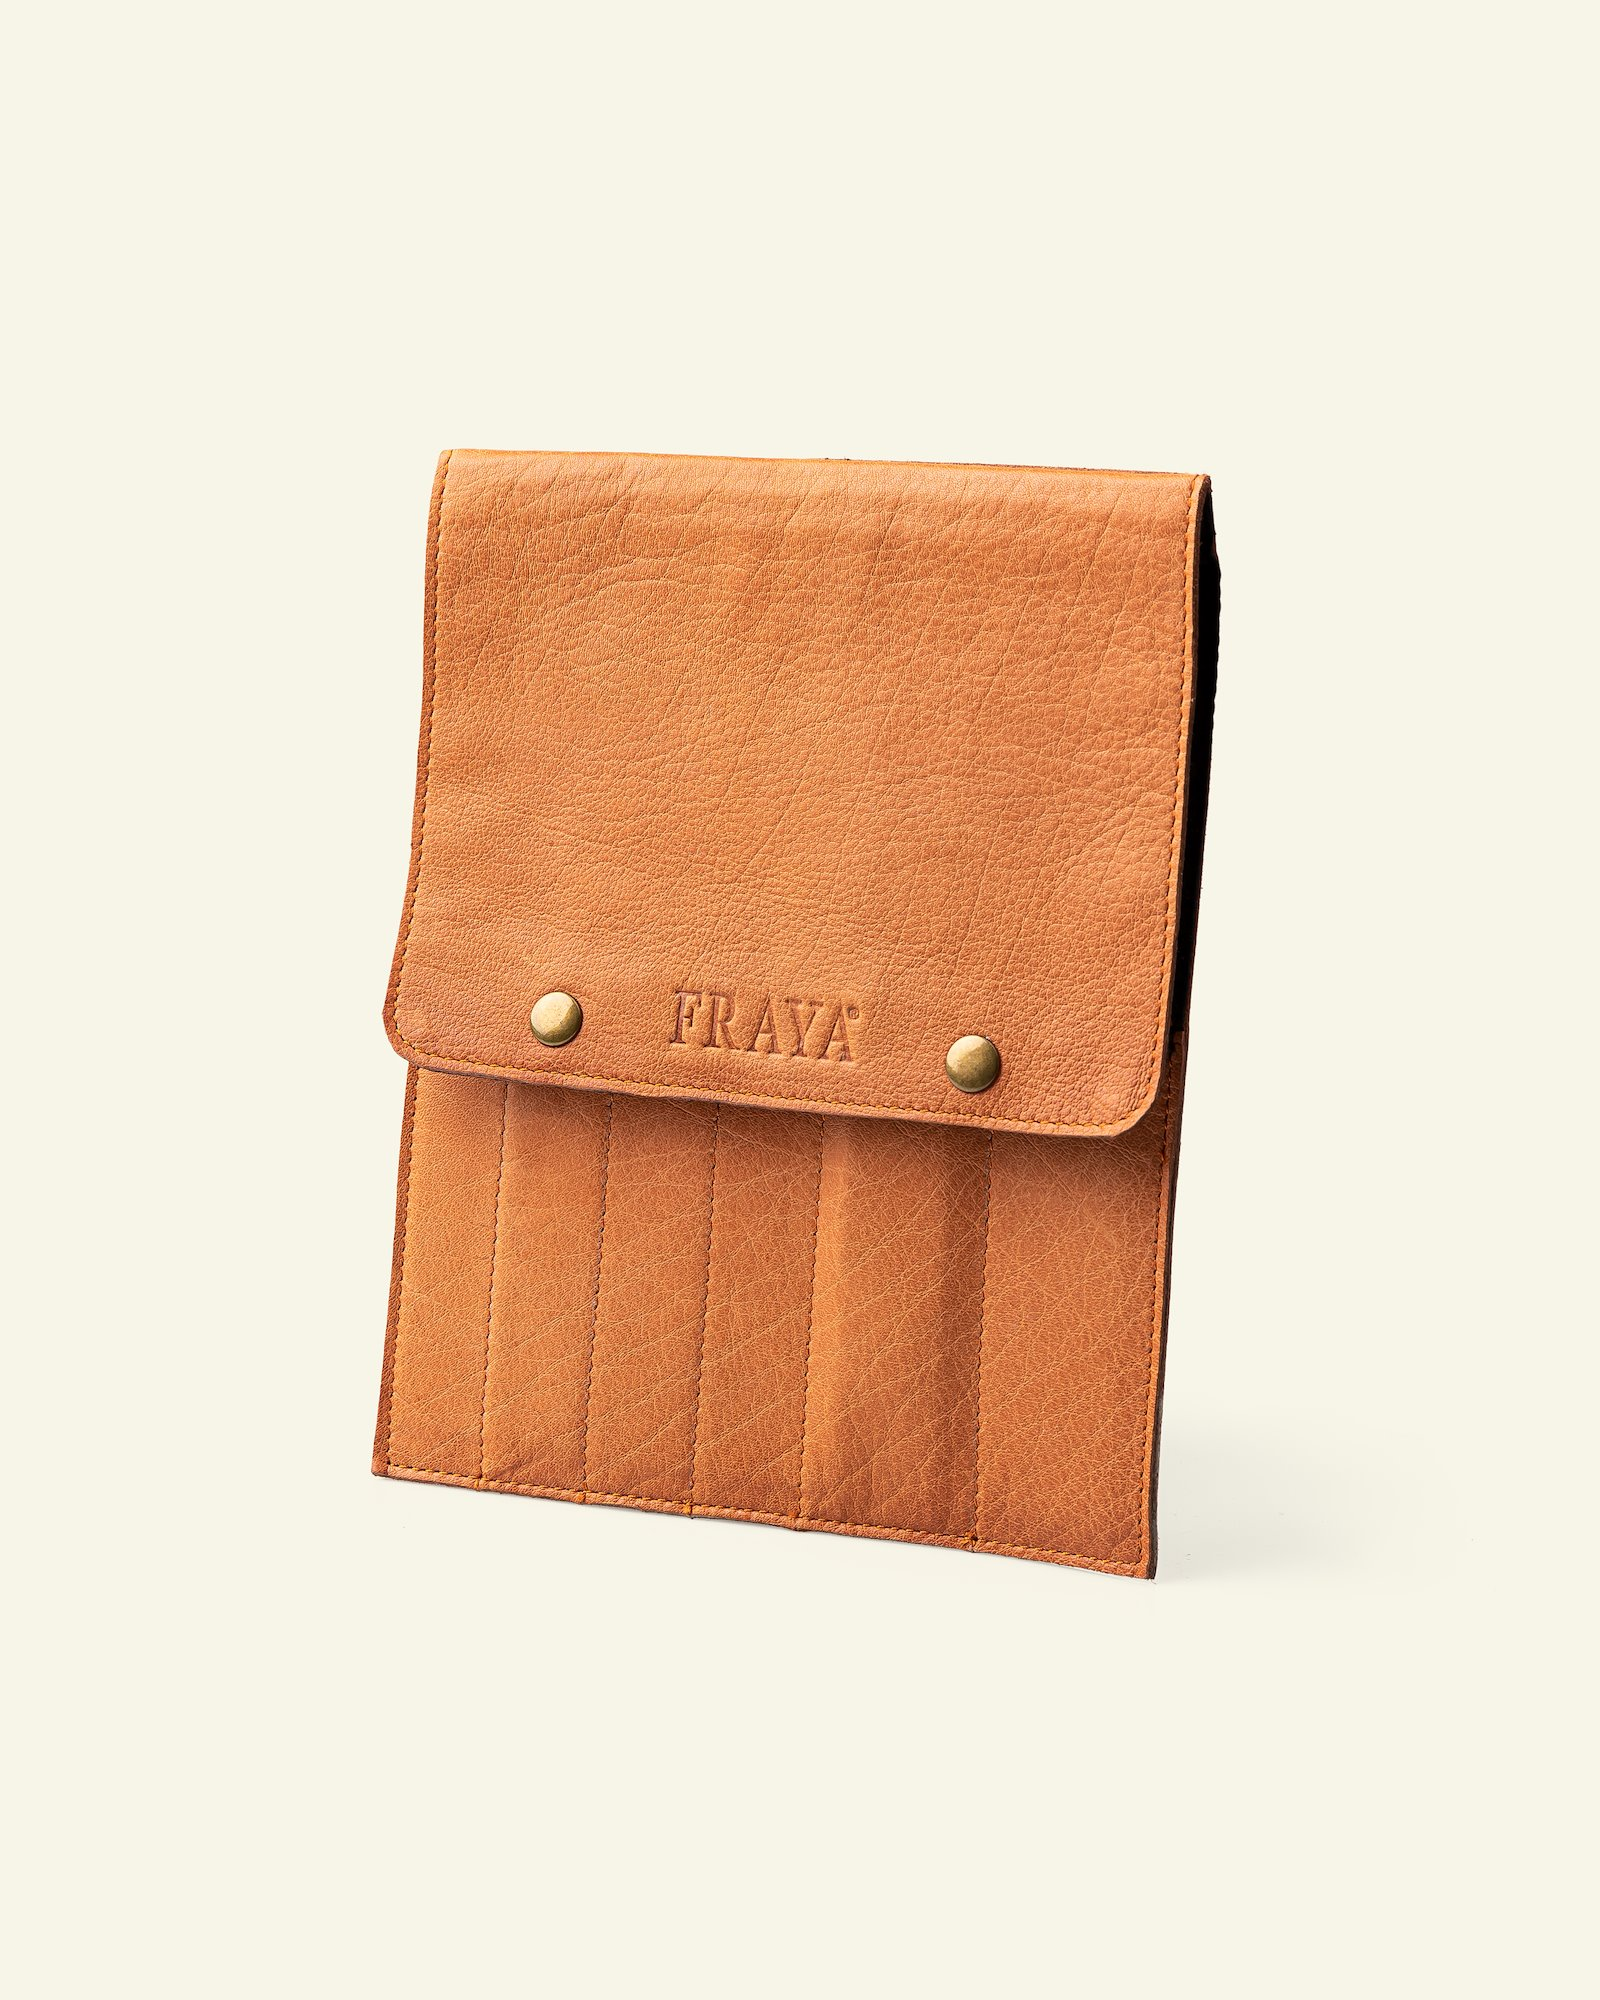 FRAYA leather sleeve, 24x18cm, brown